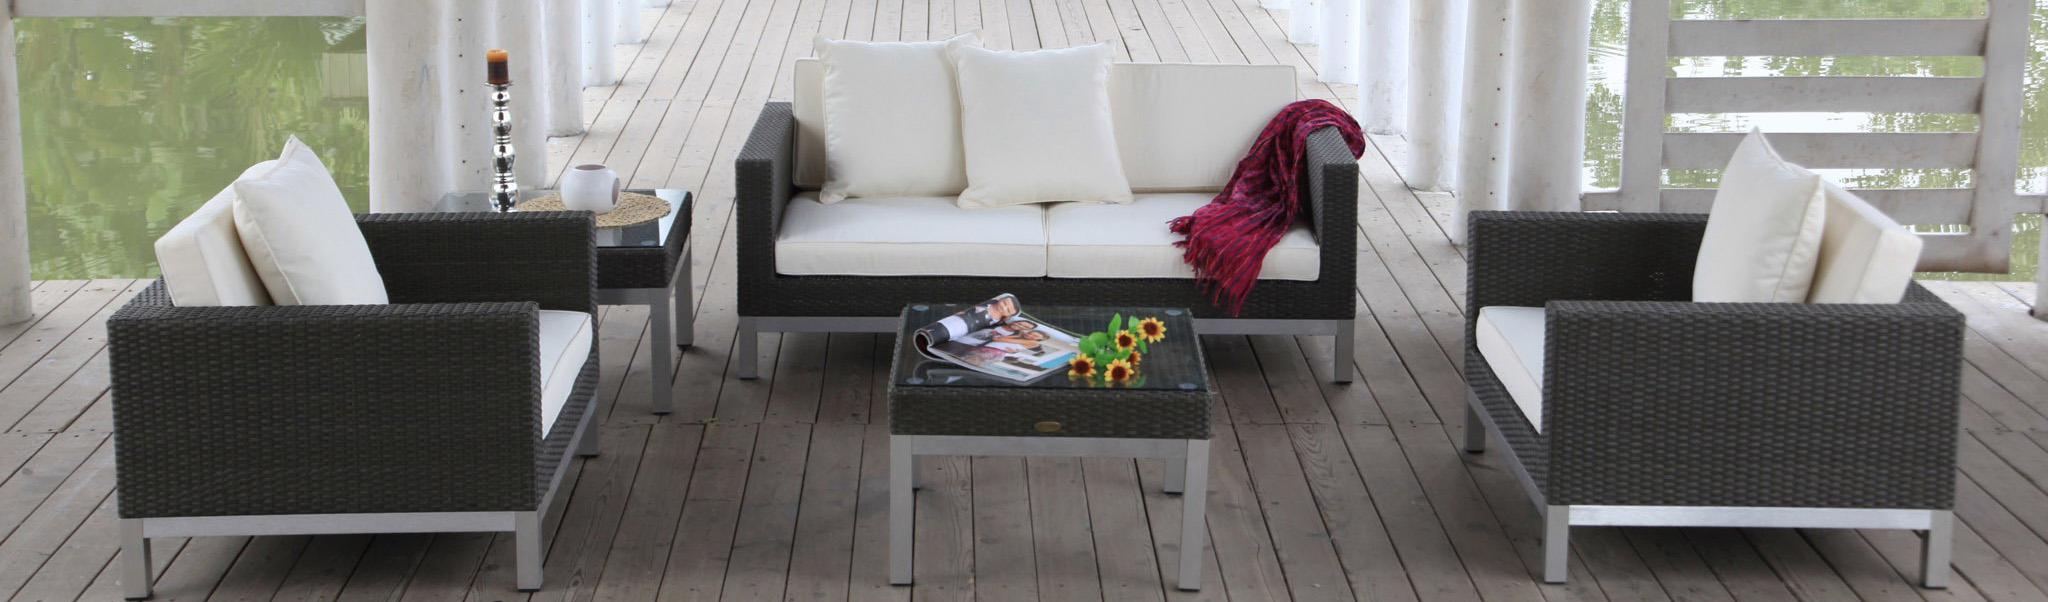 Rattan lounge schwarz  Rattan Lounge Furniture - Reasonably Priced - Patio, Garden ...